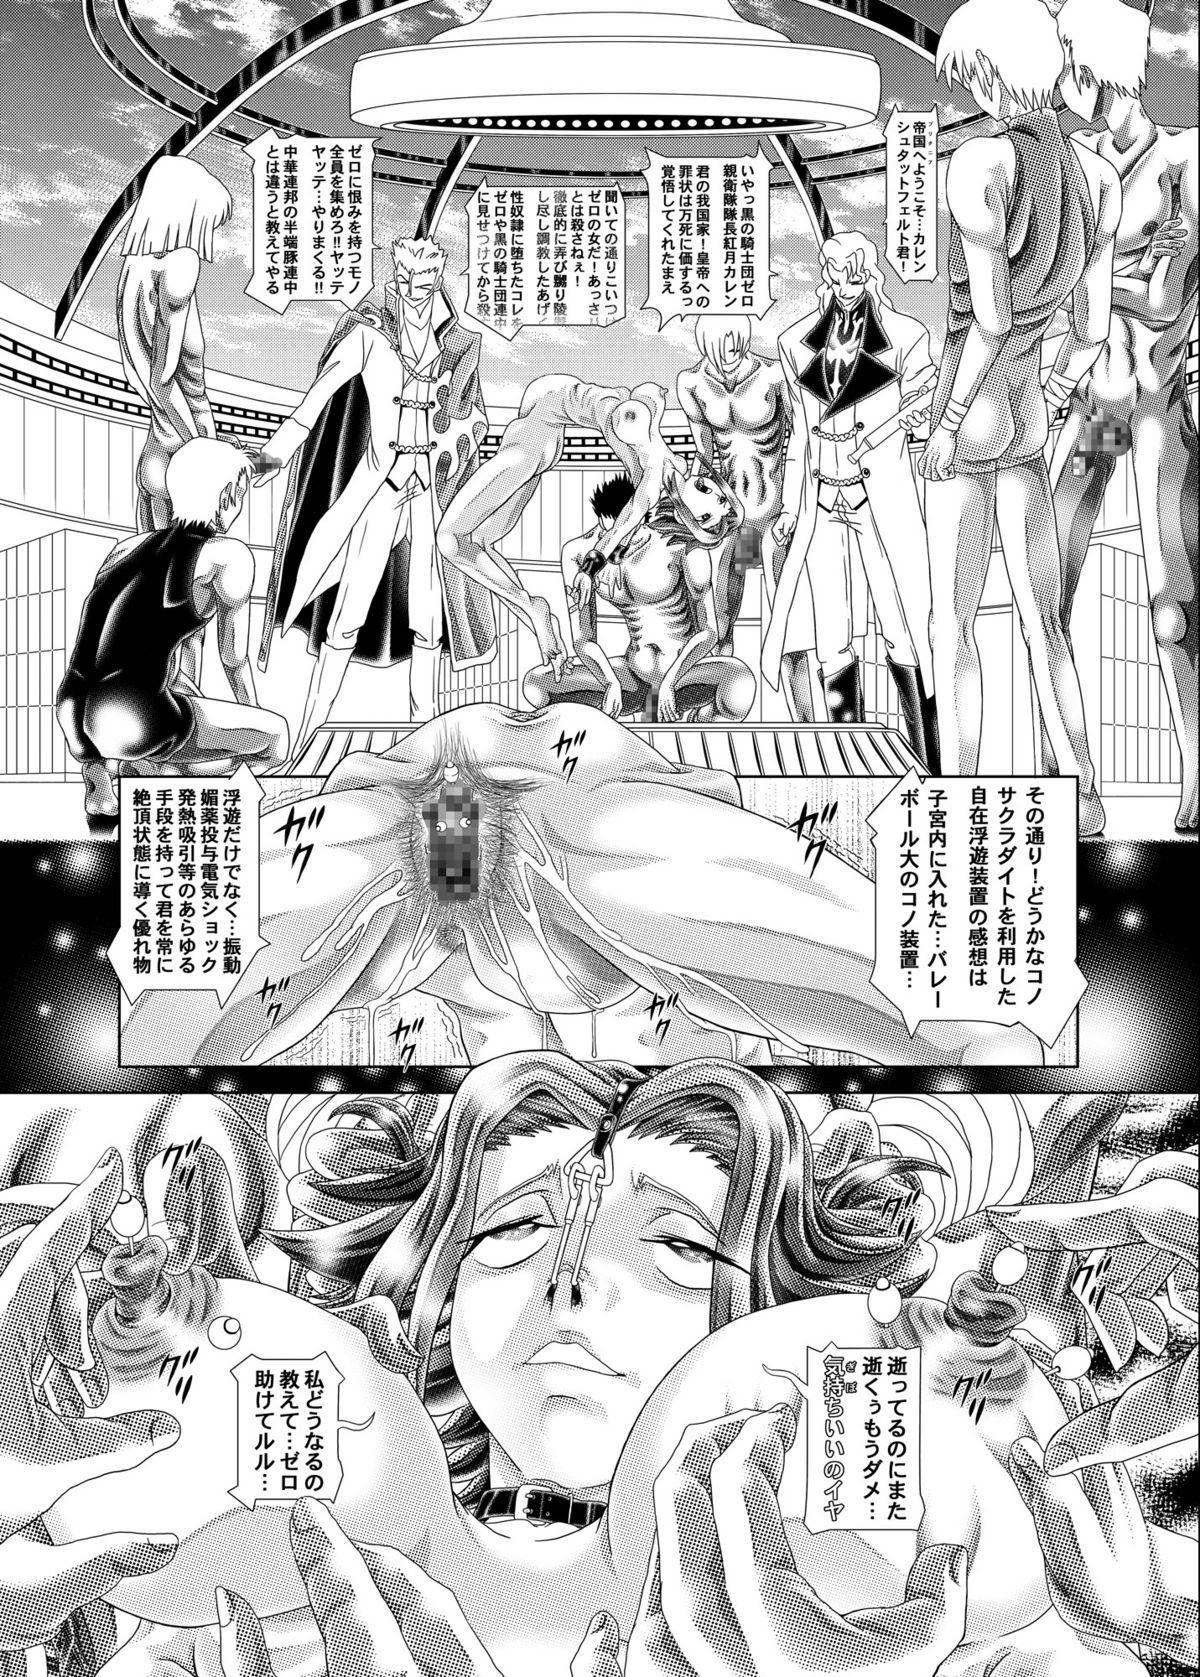 [Kaki no Boo (Kakinomoto Utamaro)] Karen - R22 of the Cord Eros - Infringement (Code Geass) [Digital] 9